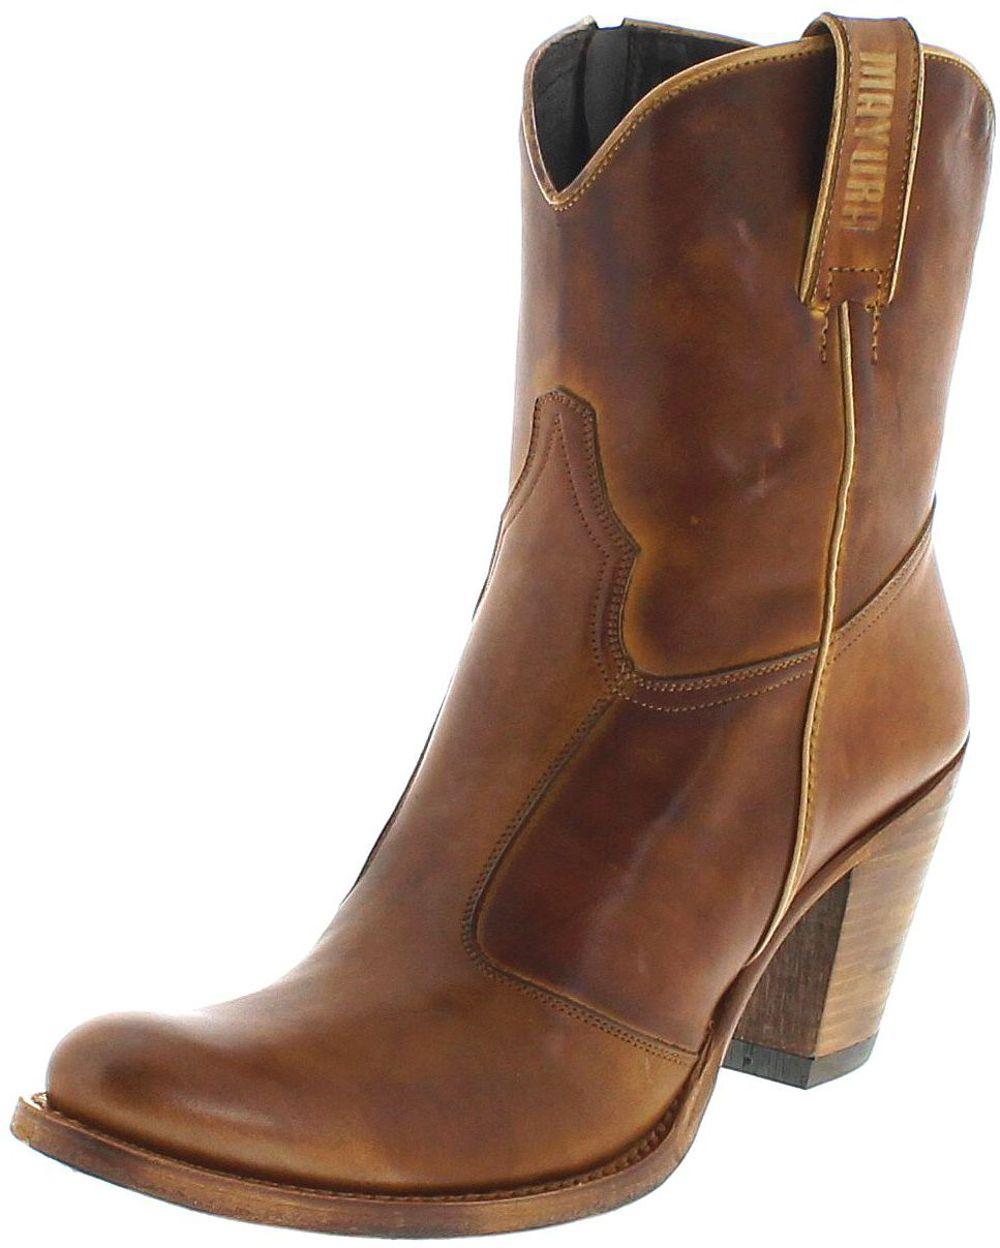 Mayura Boots MB028 Lavado Cuero Fashion Stiefelette - Braun